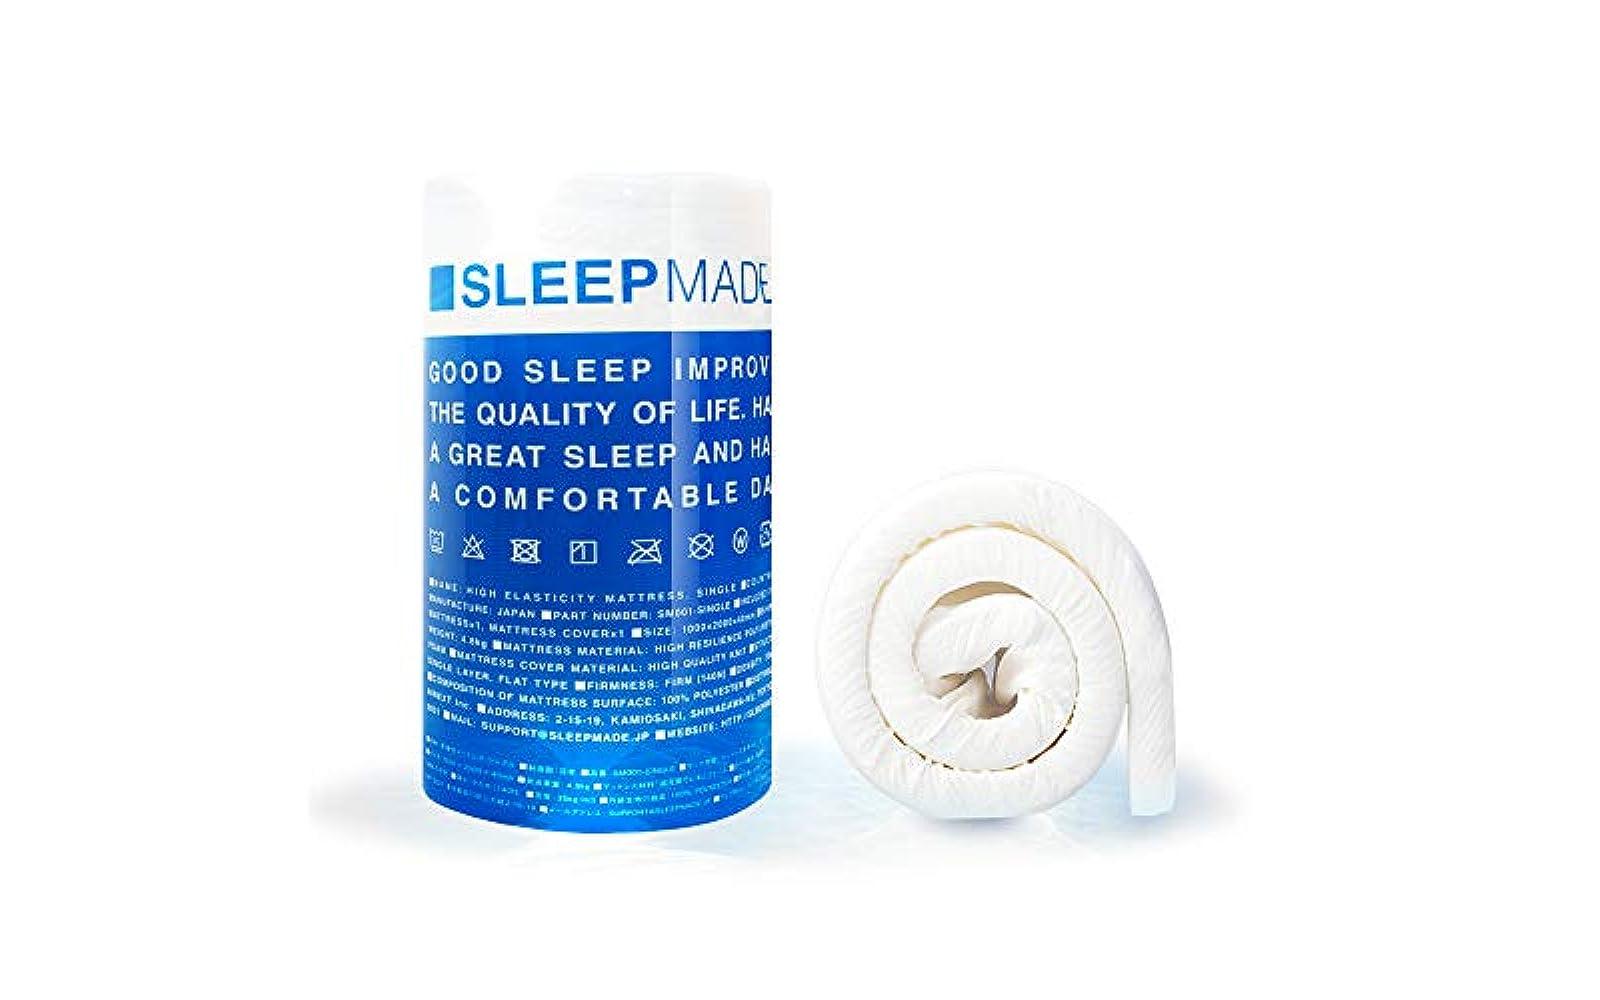 SLEEPMADE 高反発マットレス シングル | Sleepee(スリーピー)